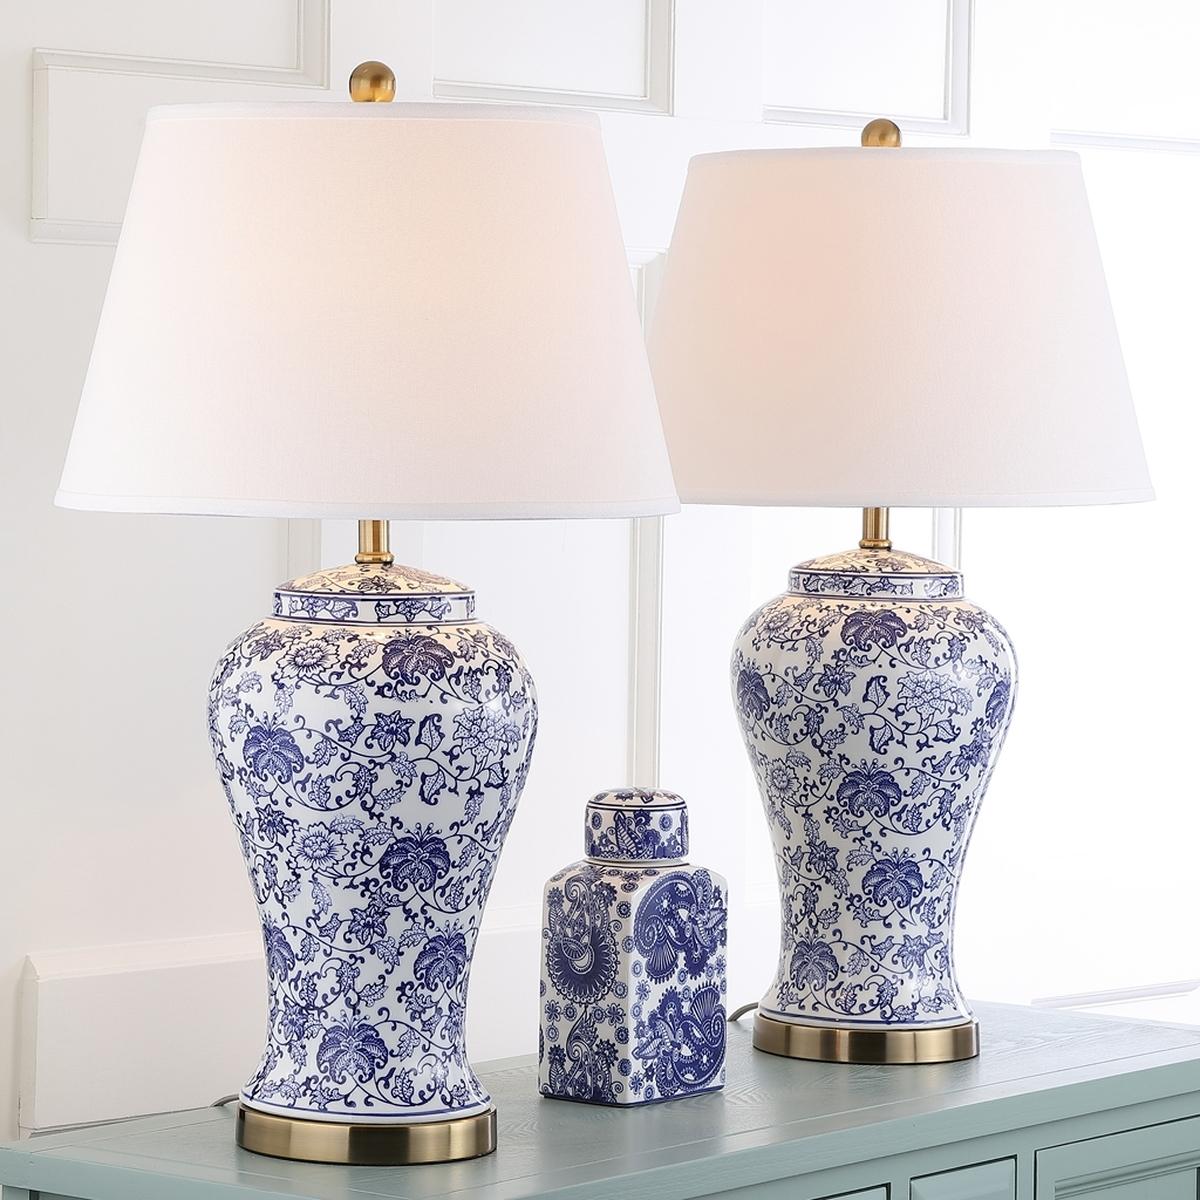 Lit4170b Set2 Table Lamps Lighting By Safavieh